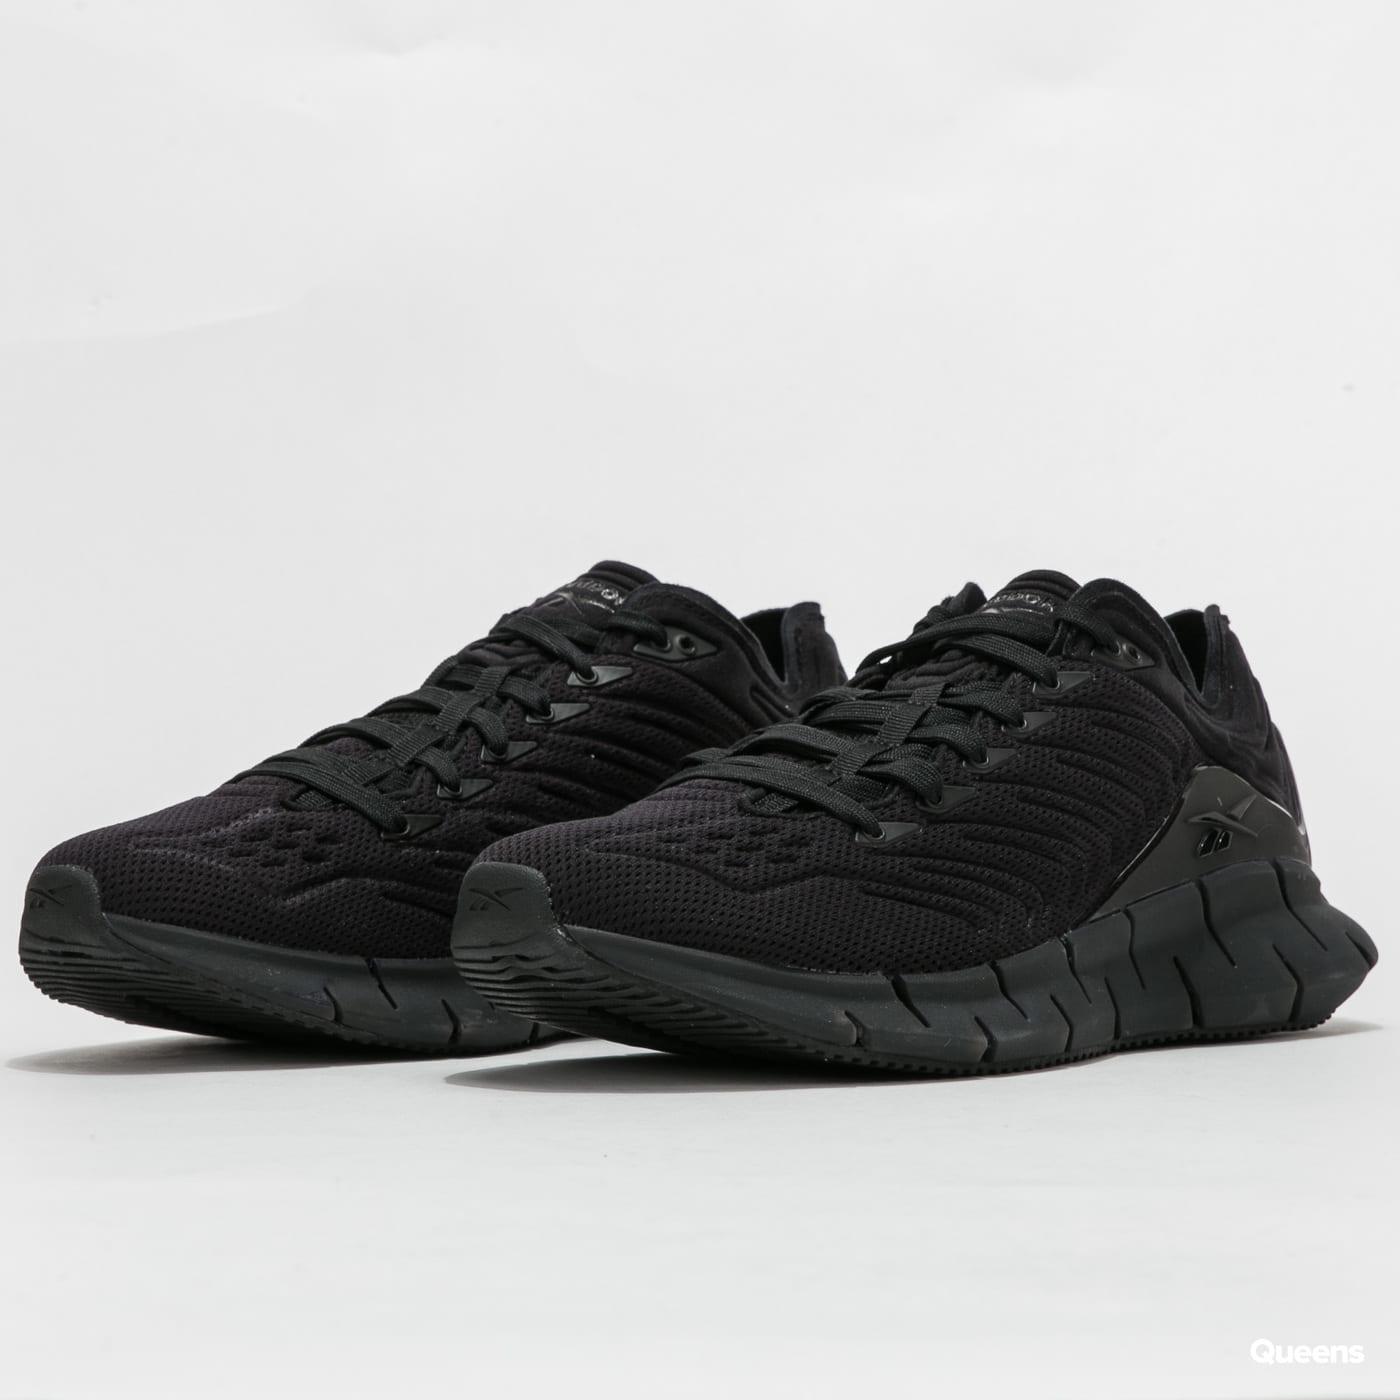 En segundo lugar obra maestra Agresivo  Sneakers Reebok Zig Kinetica black / black / trugr7 (EH1722 ...